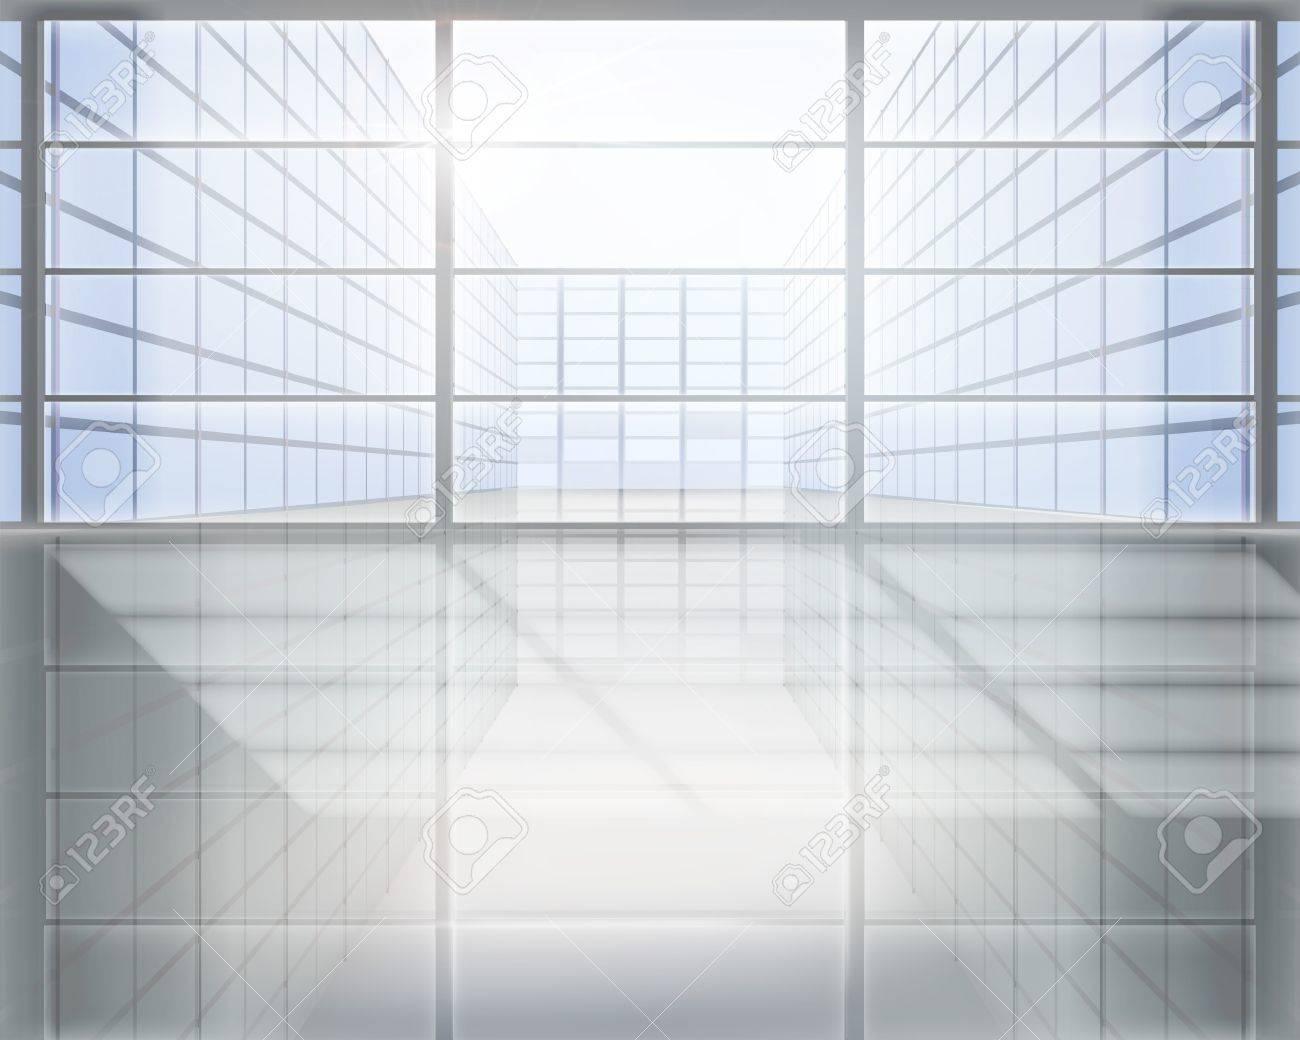 Business center. illustration. Stock Vector - 14403506